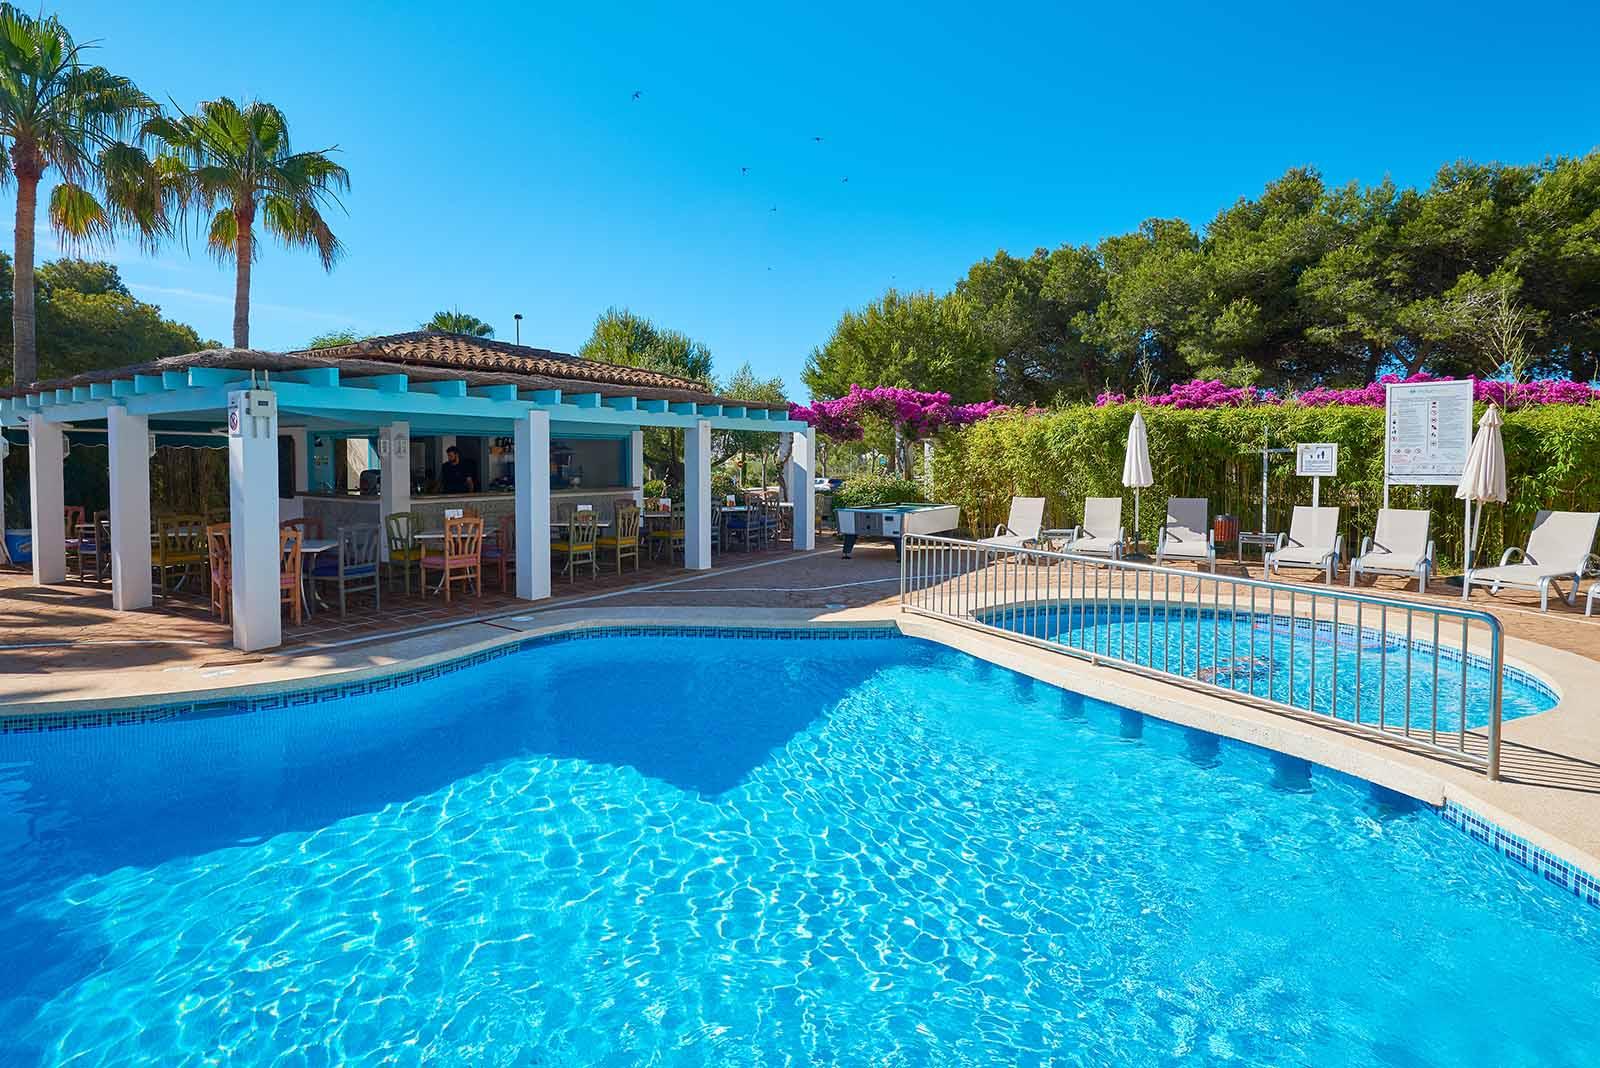 Protur Bahia Azul Apartaments In Cala Bona Mallorca Protur Hotels